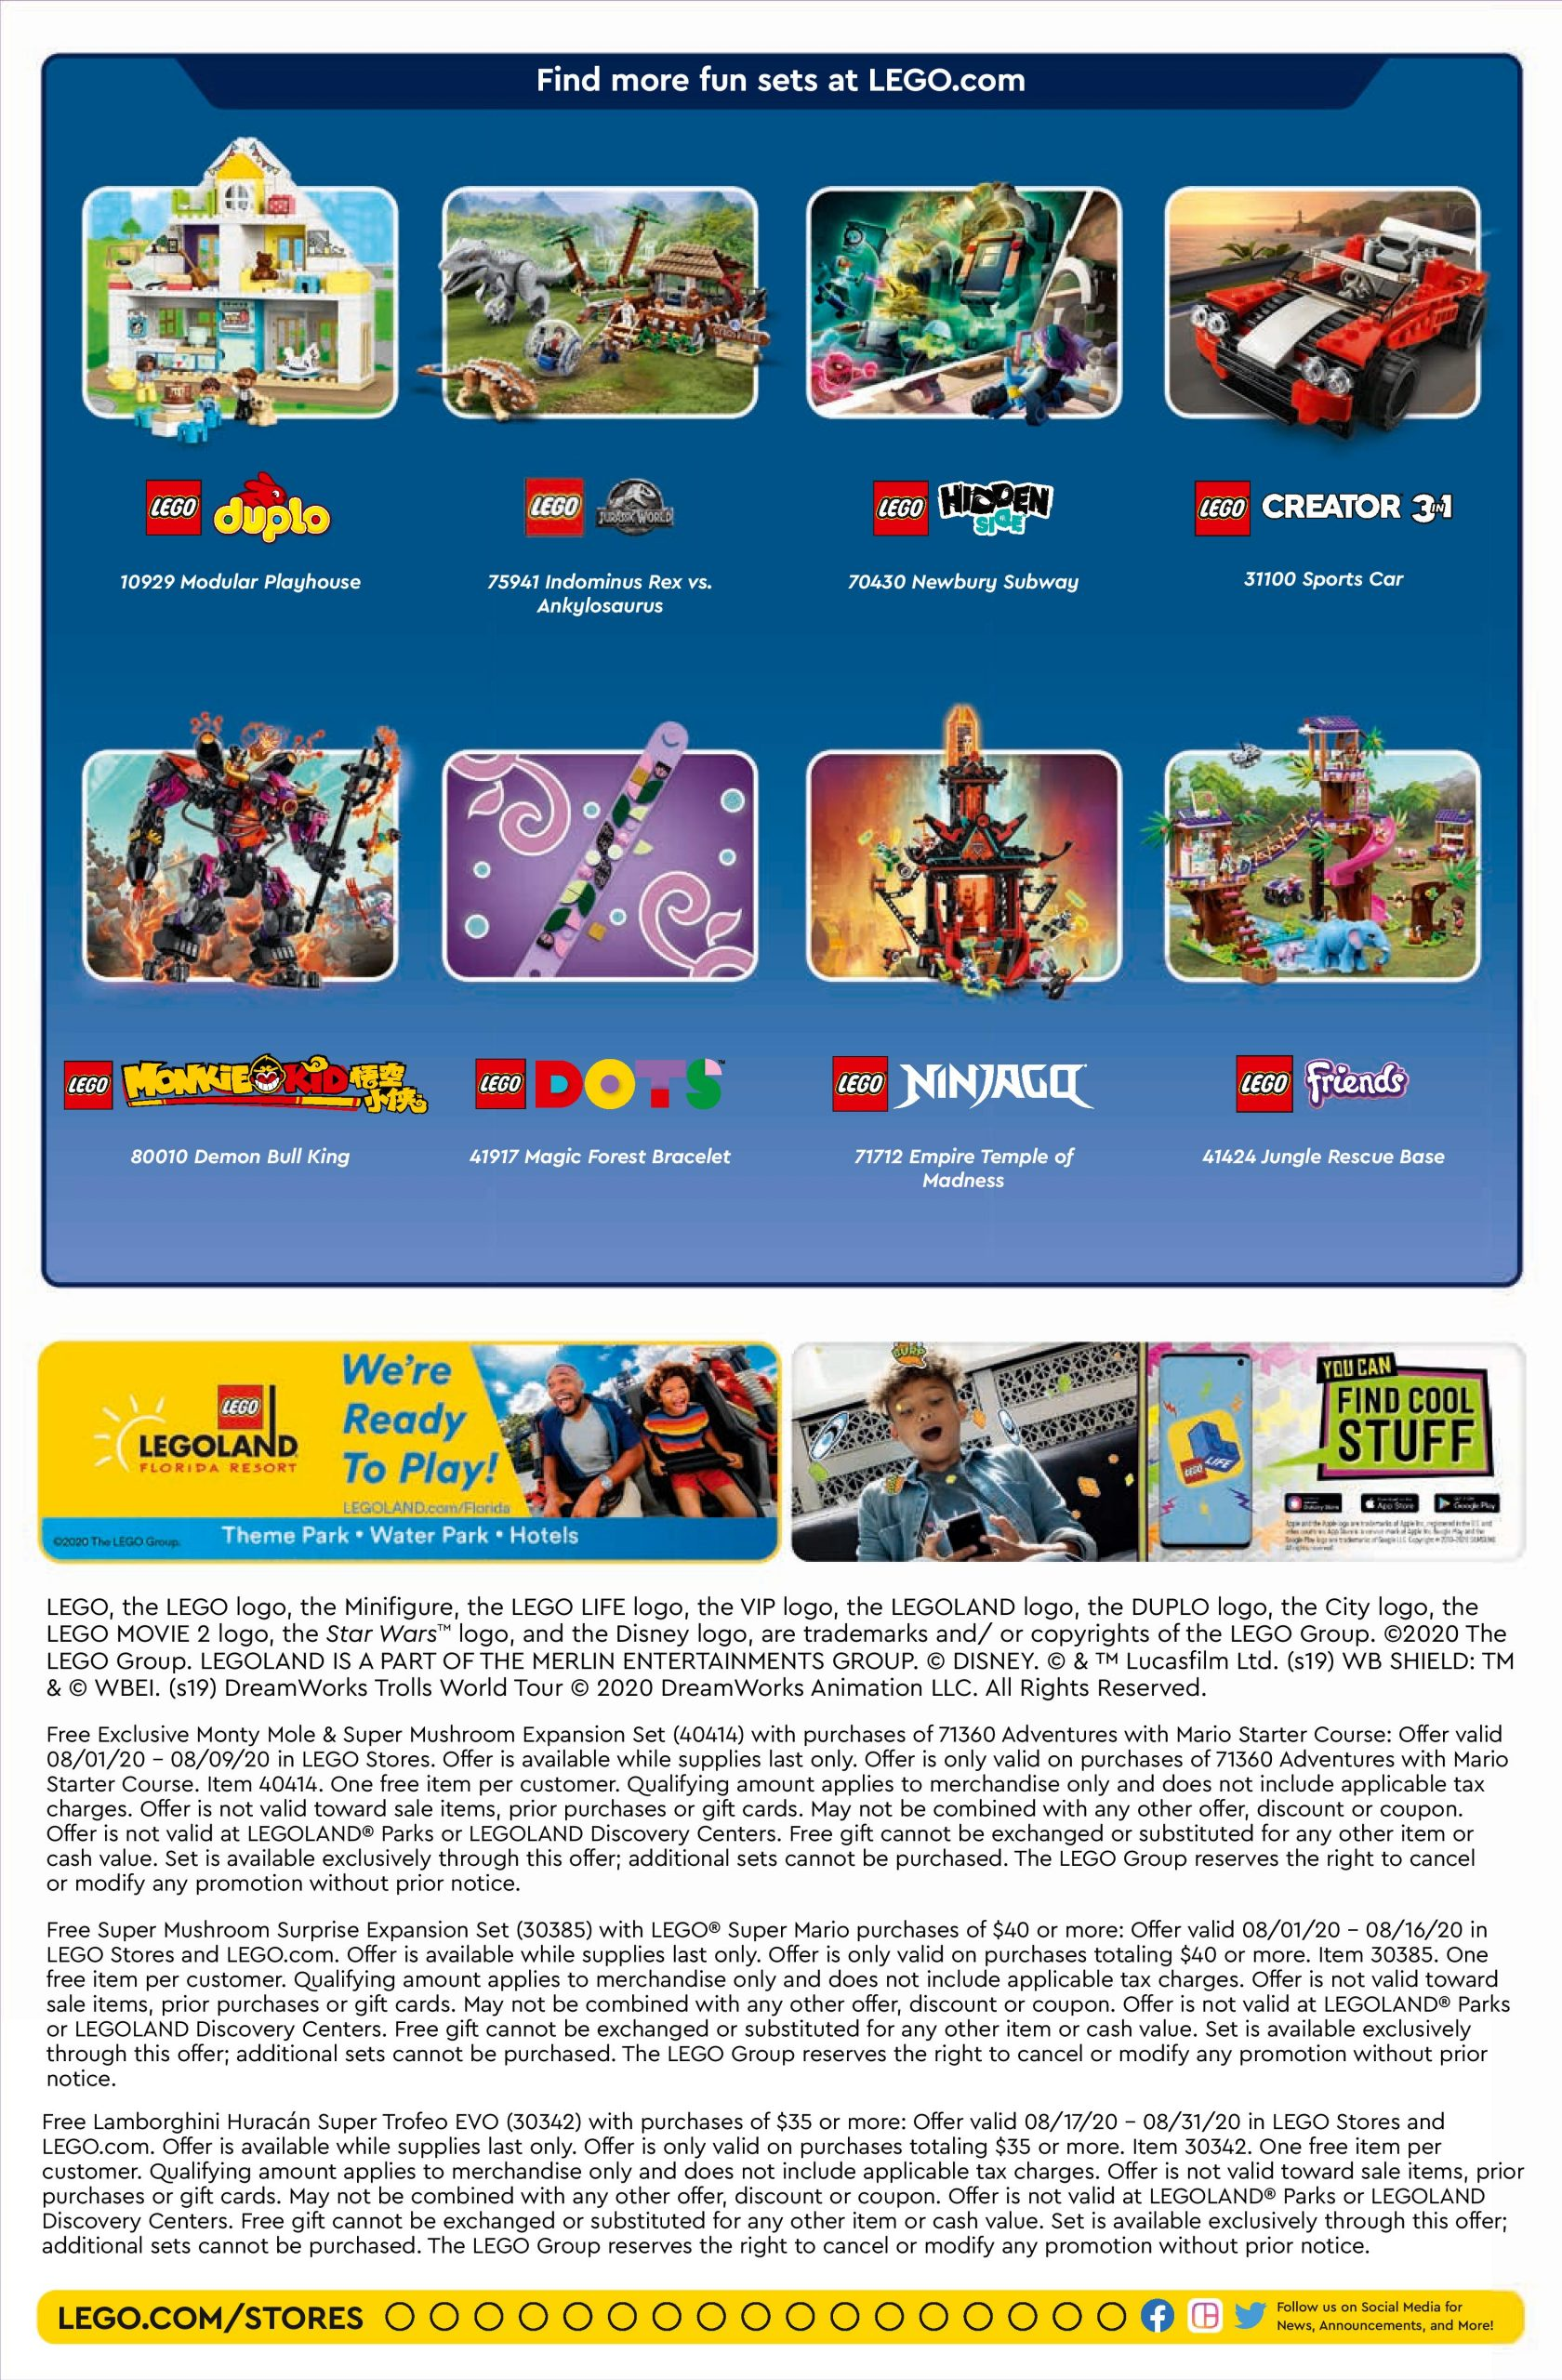 Lego August 2022 Calendar.Lego August 2020 Store Calendar Promotions Events The Brick Fan